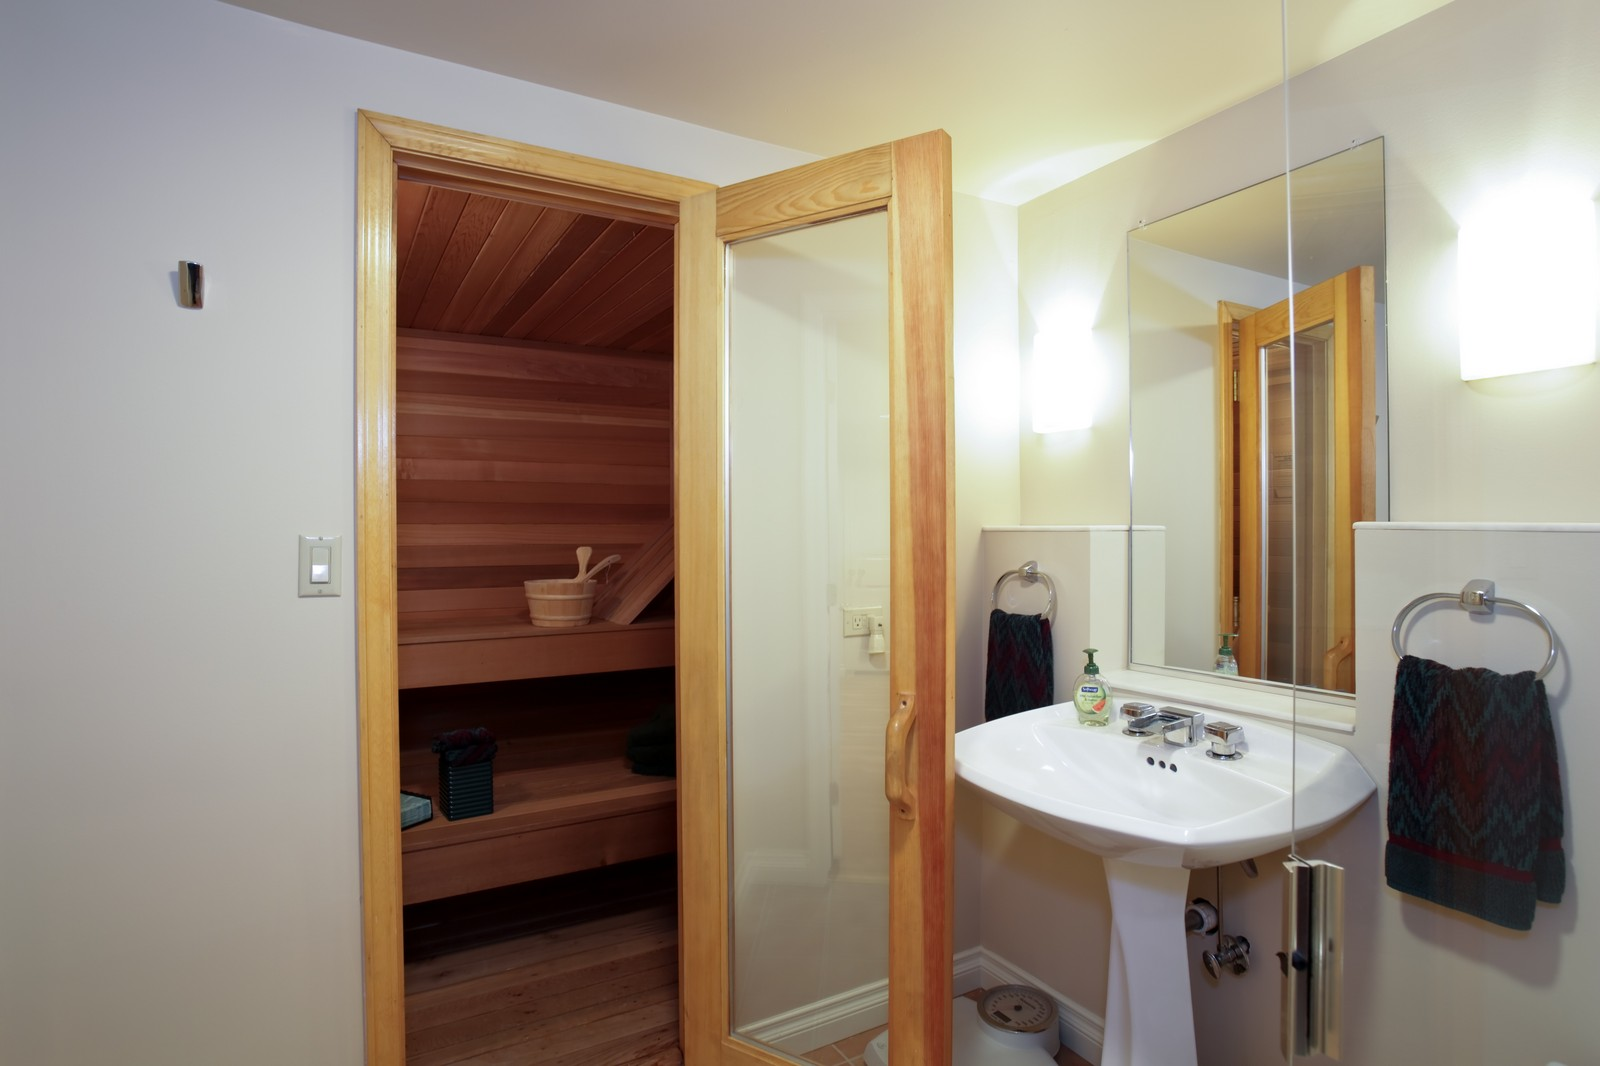 Real Estate Photography - 25W445 Plamondon Rd, Wheaton, IL, 60189 - Basement Full Bath with Sauna